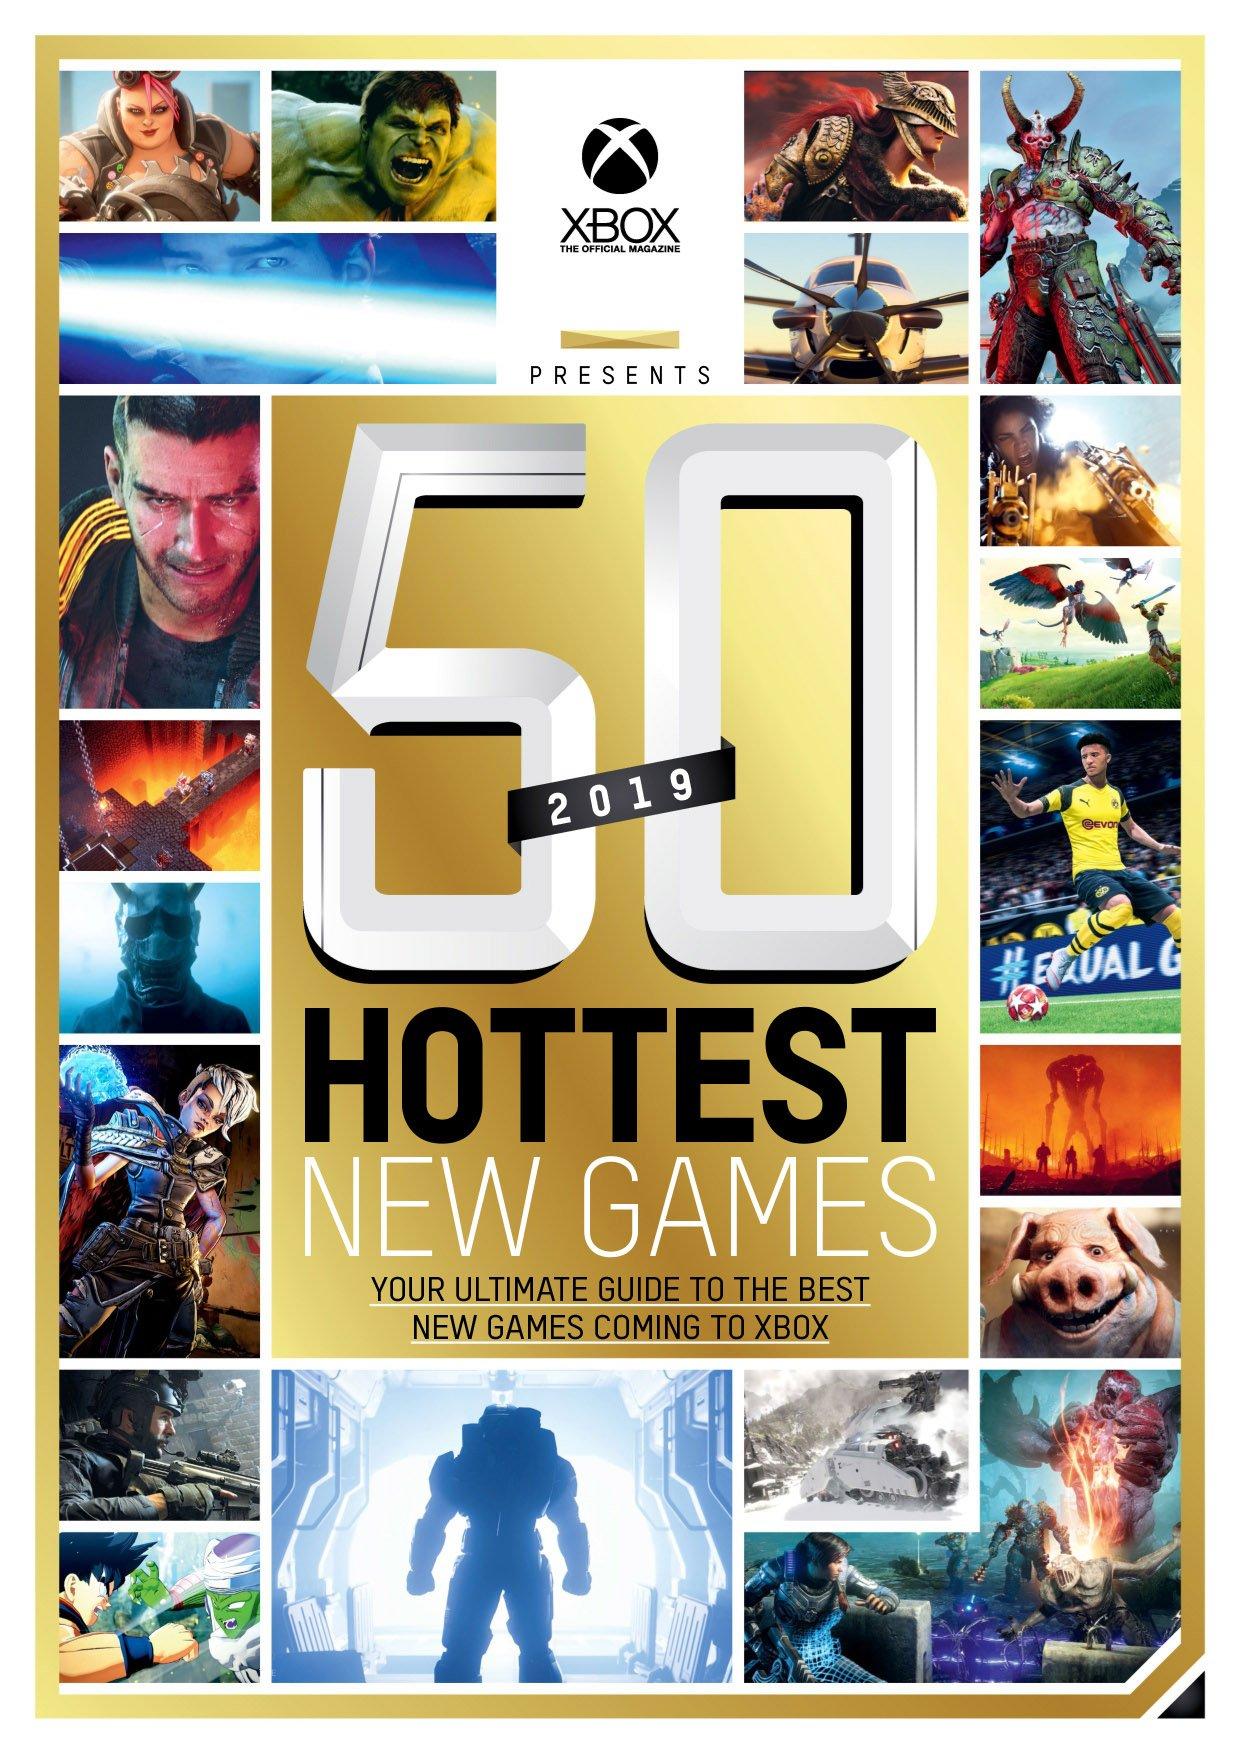 50 Hottest New Games 2019 (September 2019)